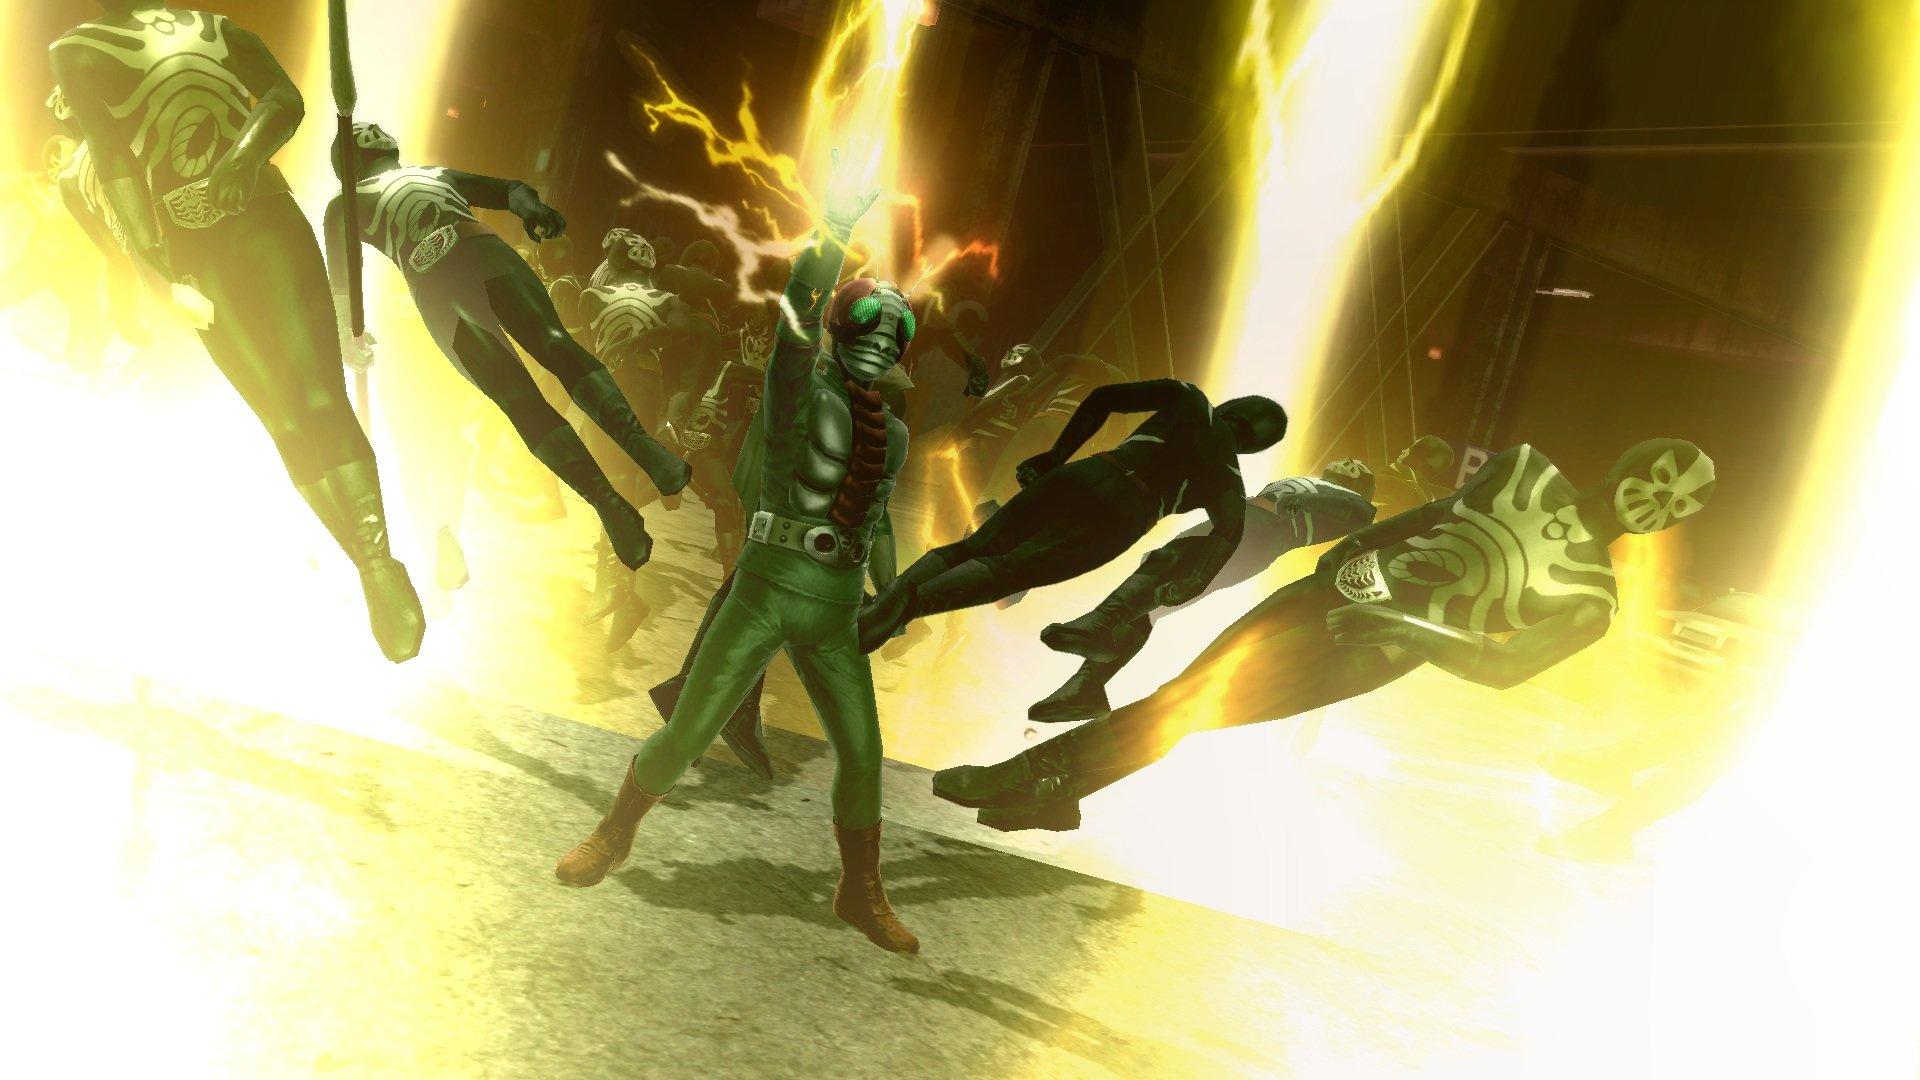 Kamen Rider: Battride War Creation Japanese Ver. (Limited edition) by Bandai (Image #4)